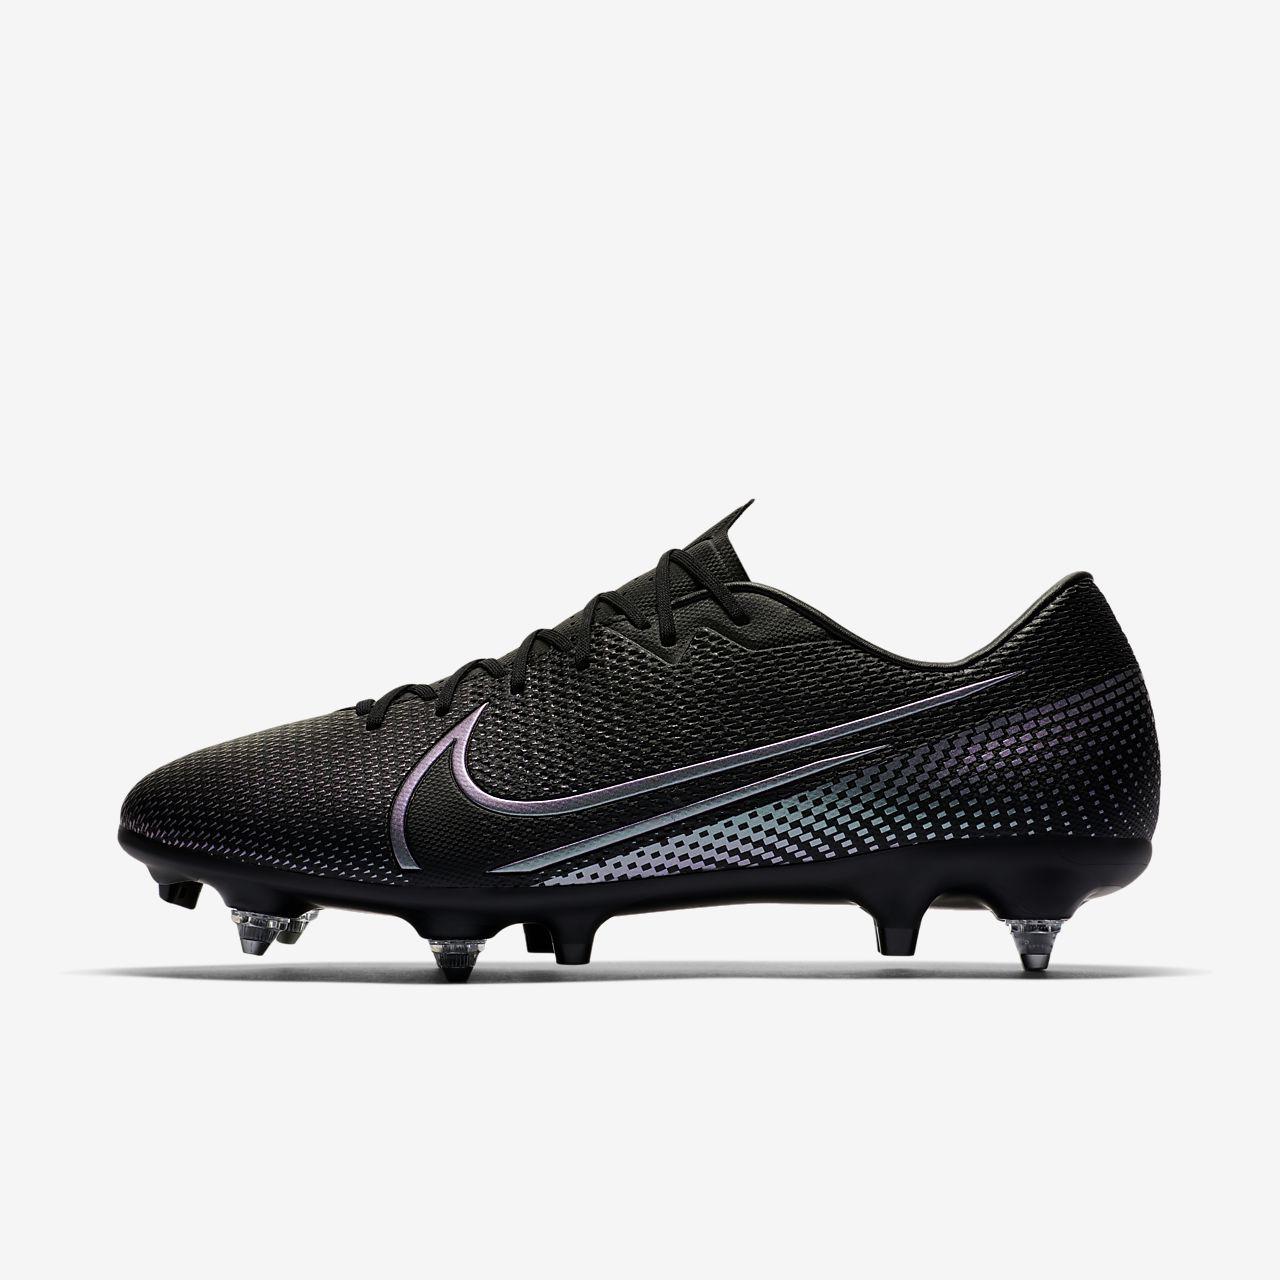 nike fotbollsskor mercurial billigt, Köpa Nike Air Max 95